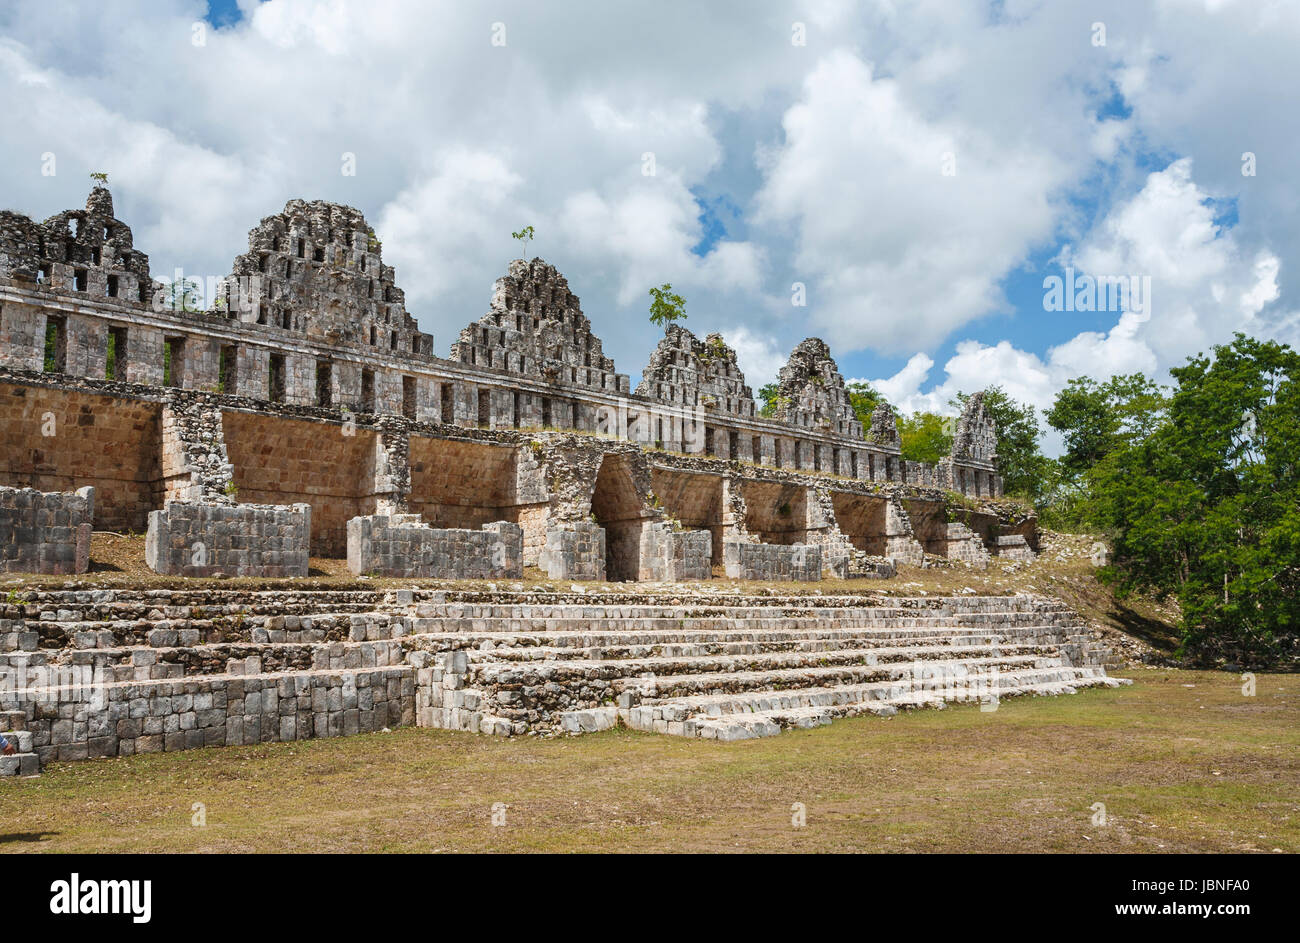 l 39 architecture maya mur en ruine uxmal une ancienne ville maya et site arch ologique pr s. Black Bedroom Furniture Sets. Home Design Ideas